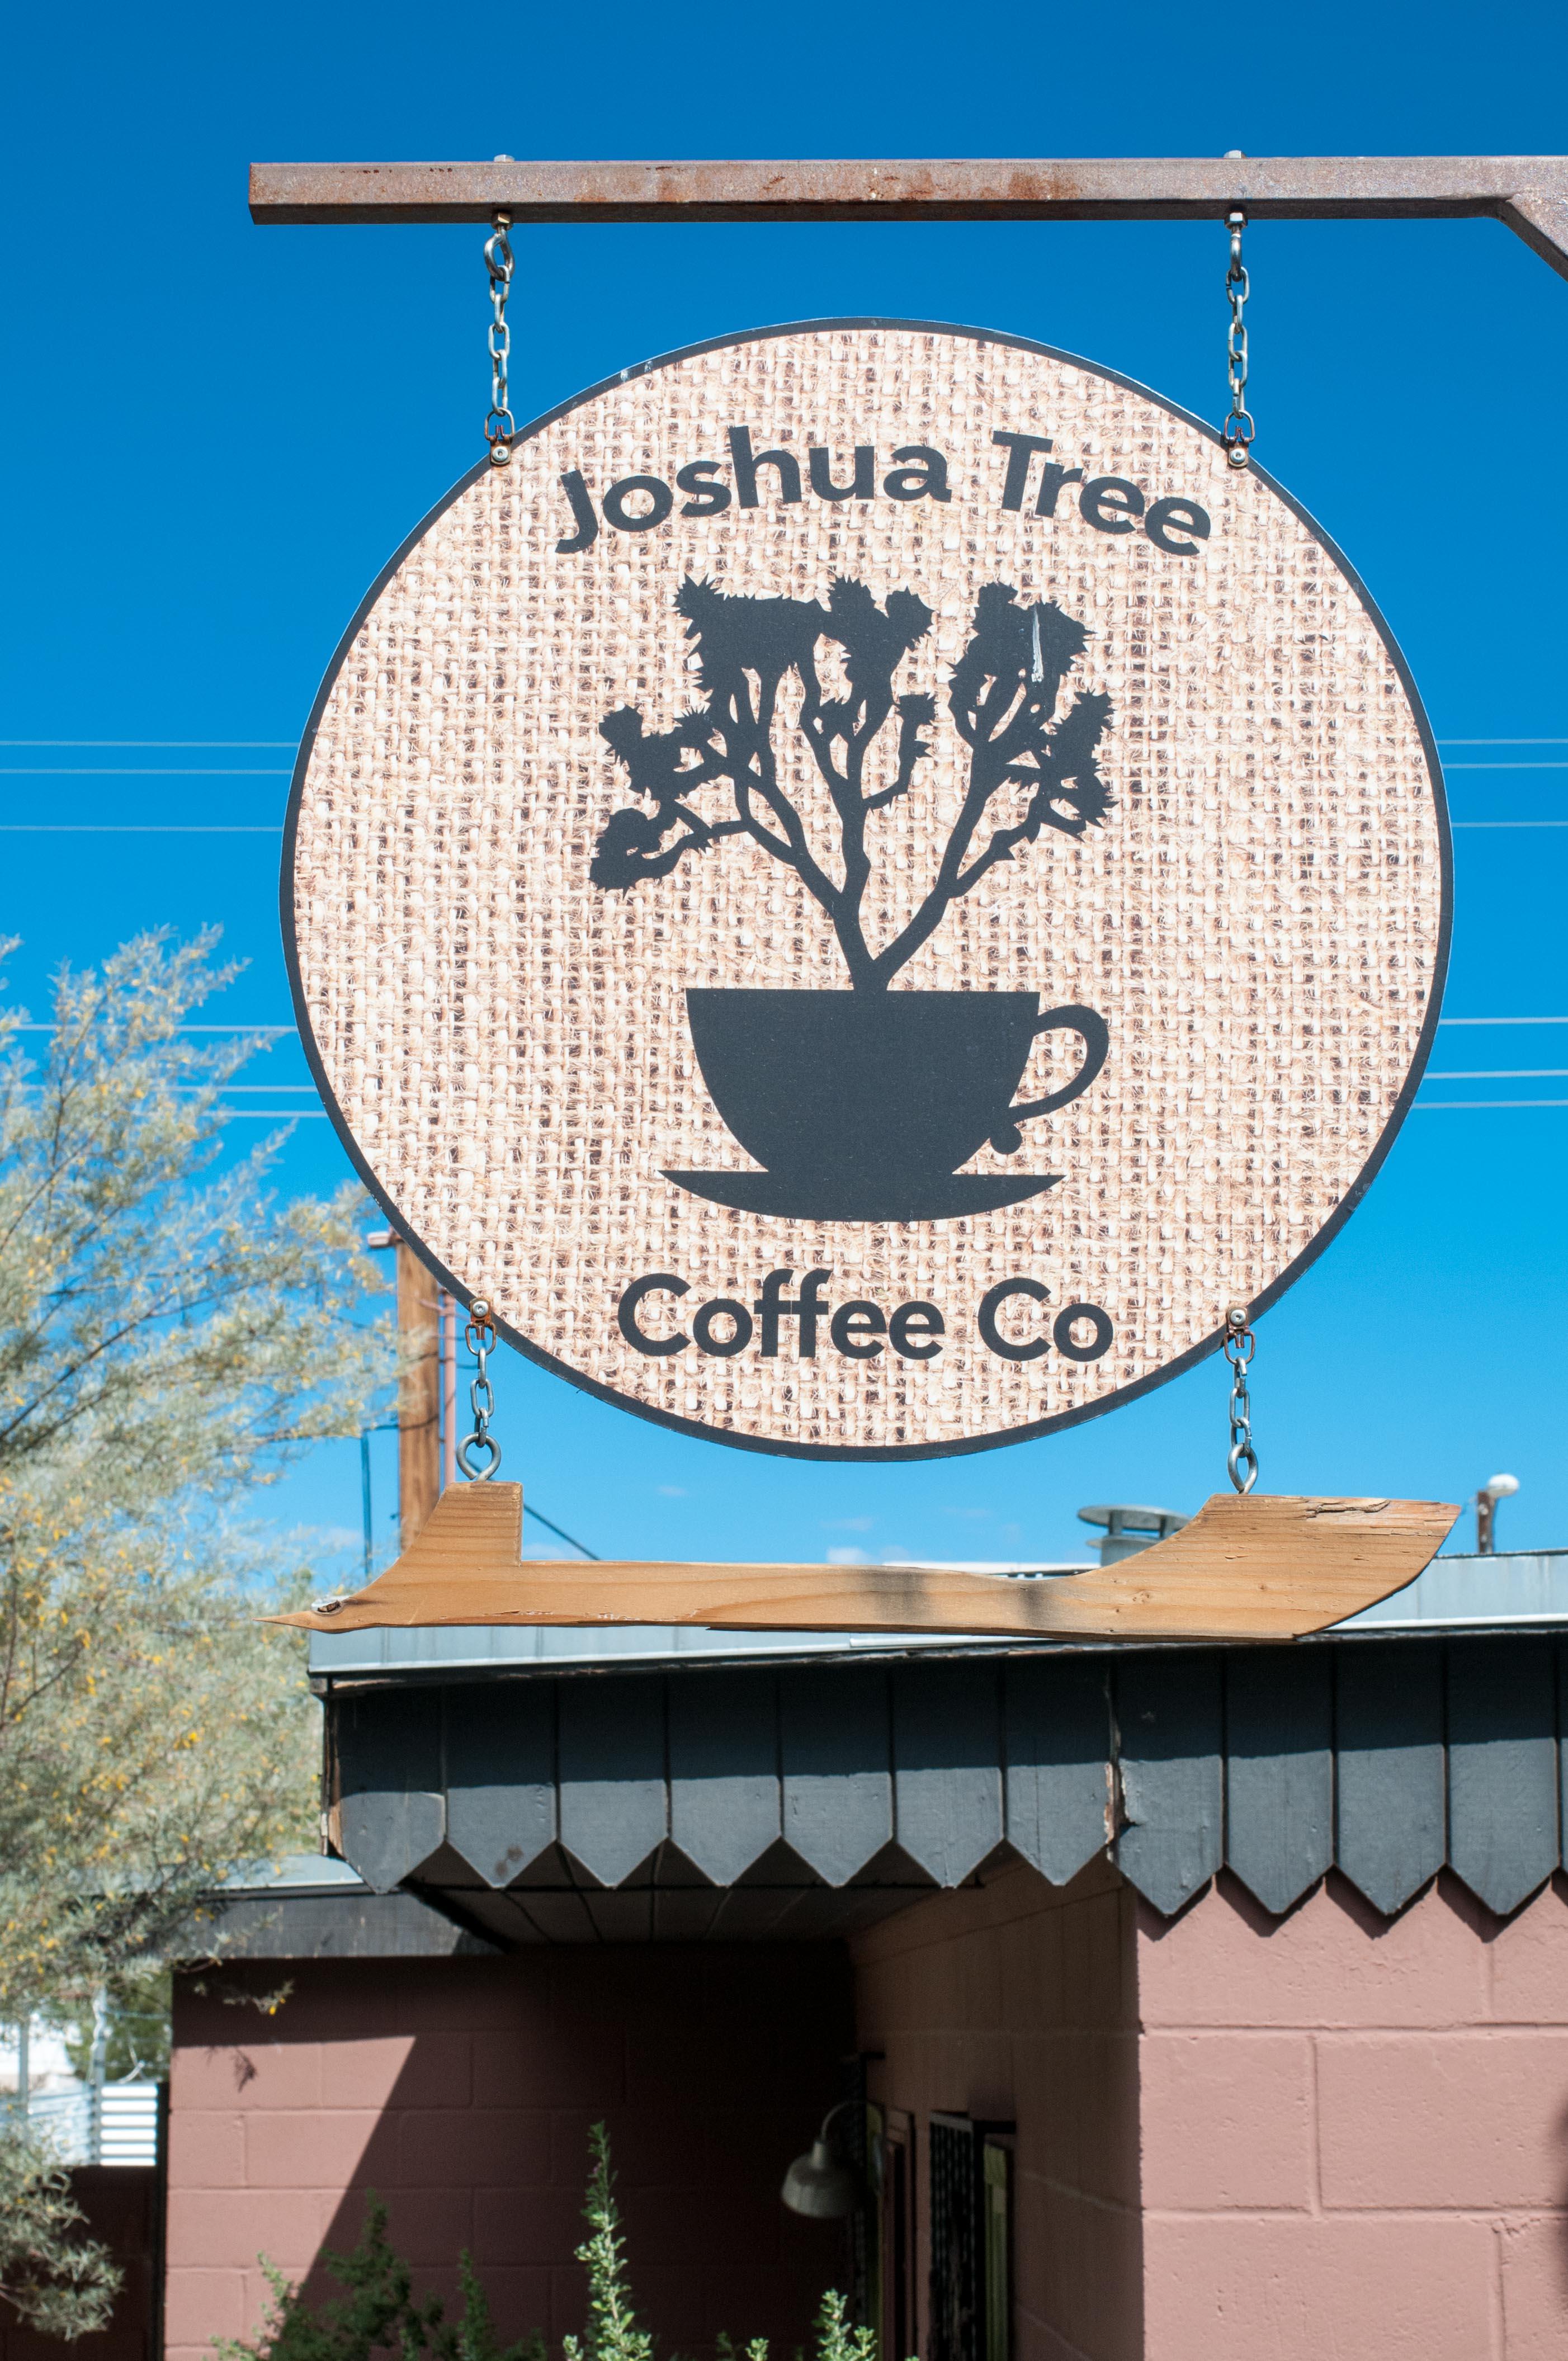 Joshua tree coffee co sign